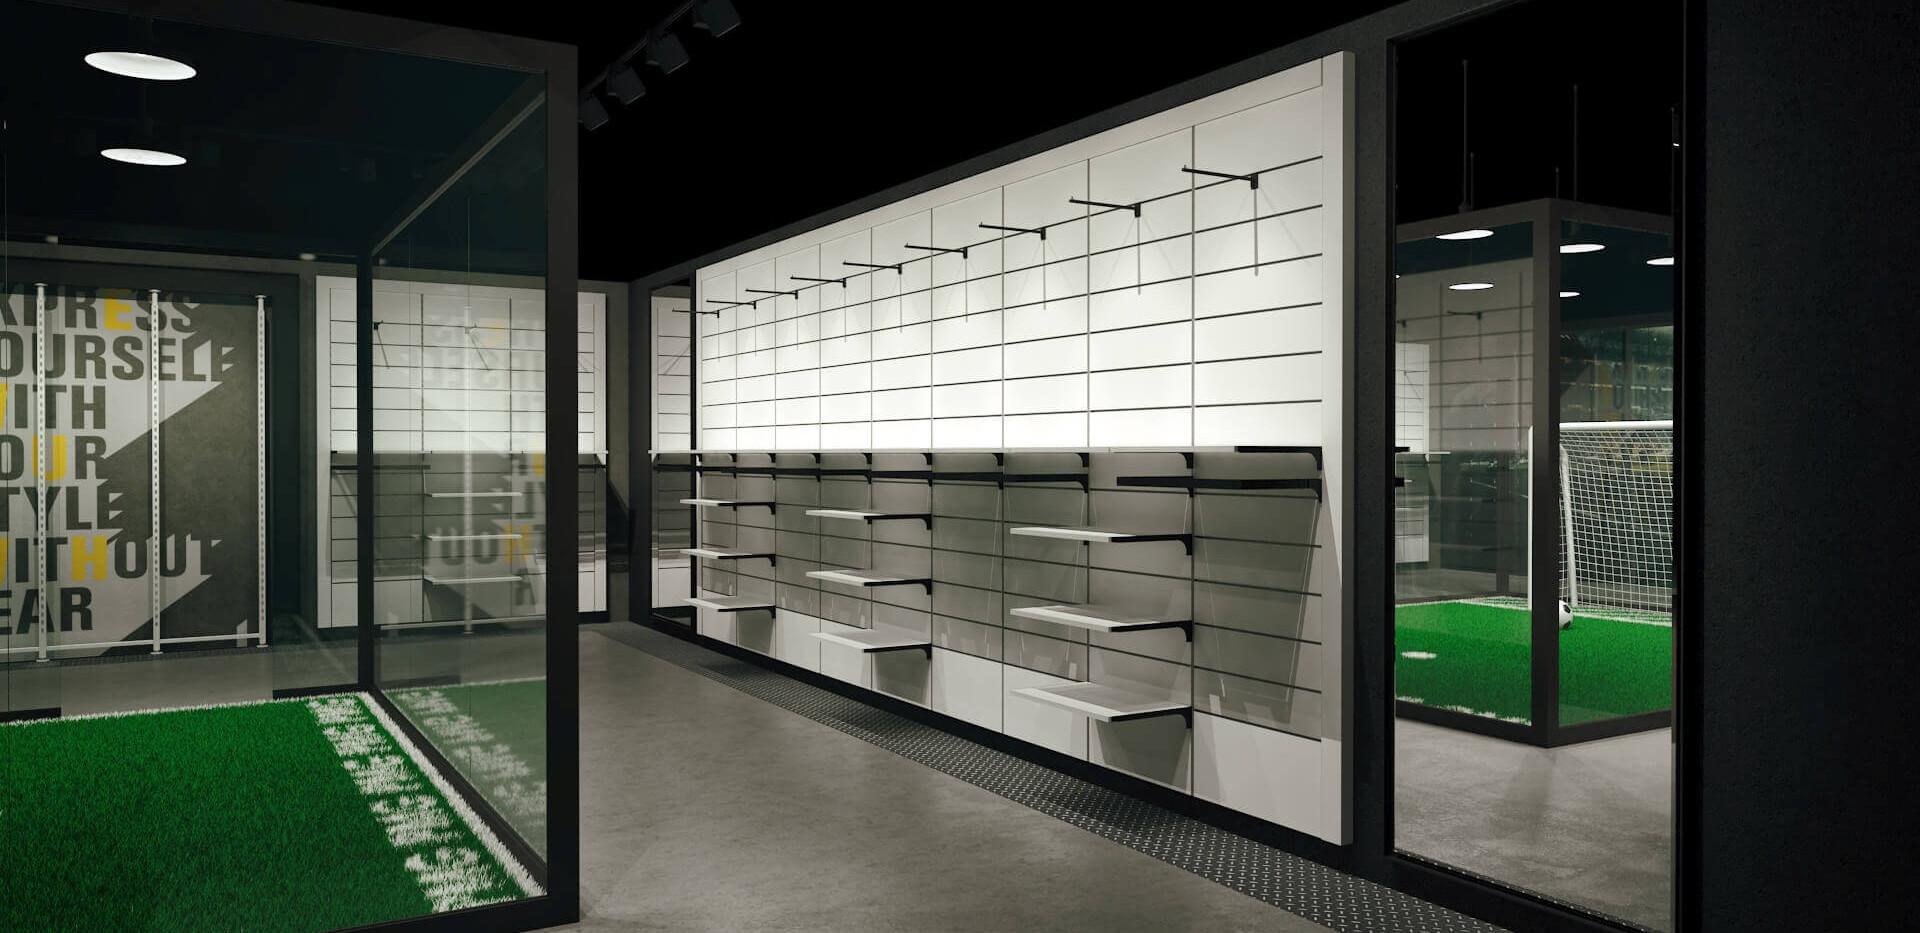 Big Sport - Sports Store Shop Design-3.j